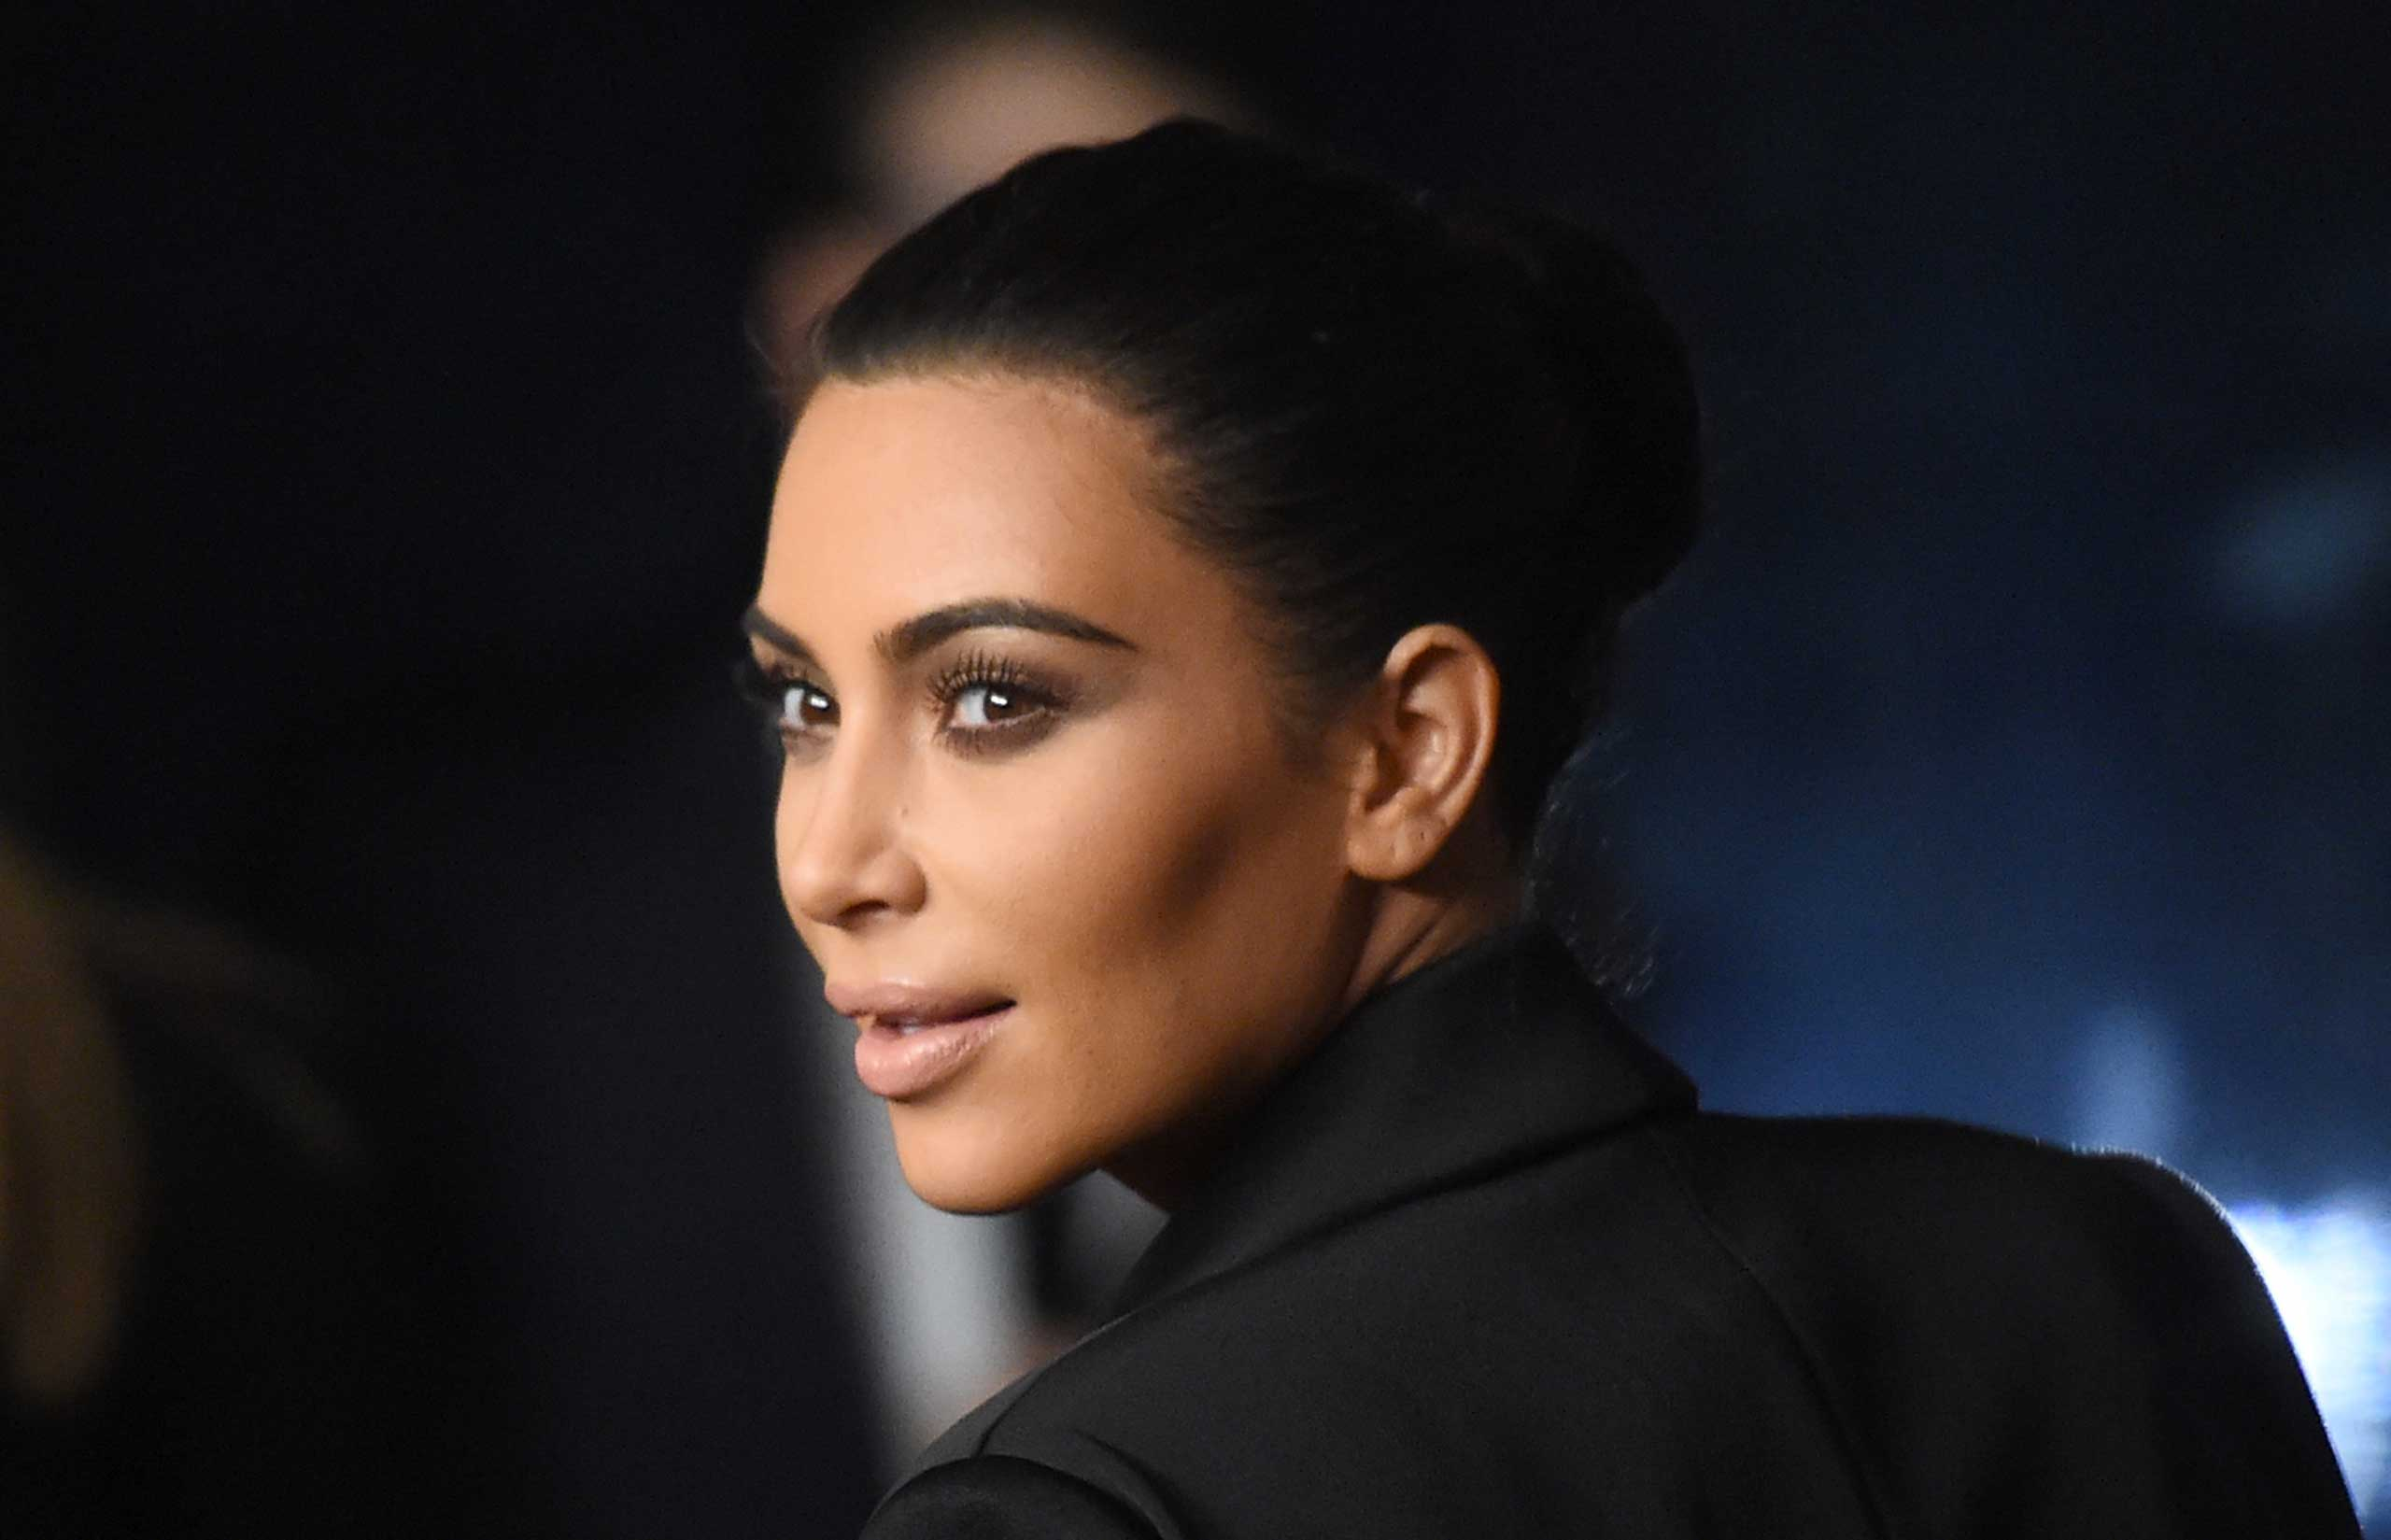 TV personality Kim Kardashian at Rihanna's First Annual Diamond Ball on Dec. 11, 2014 in Beverly Hills, Calif.